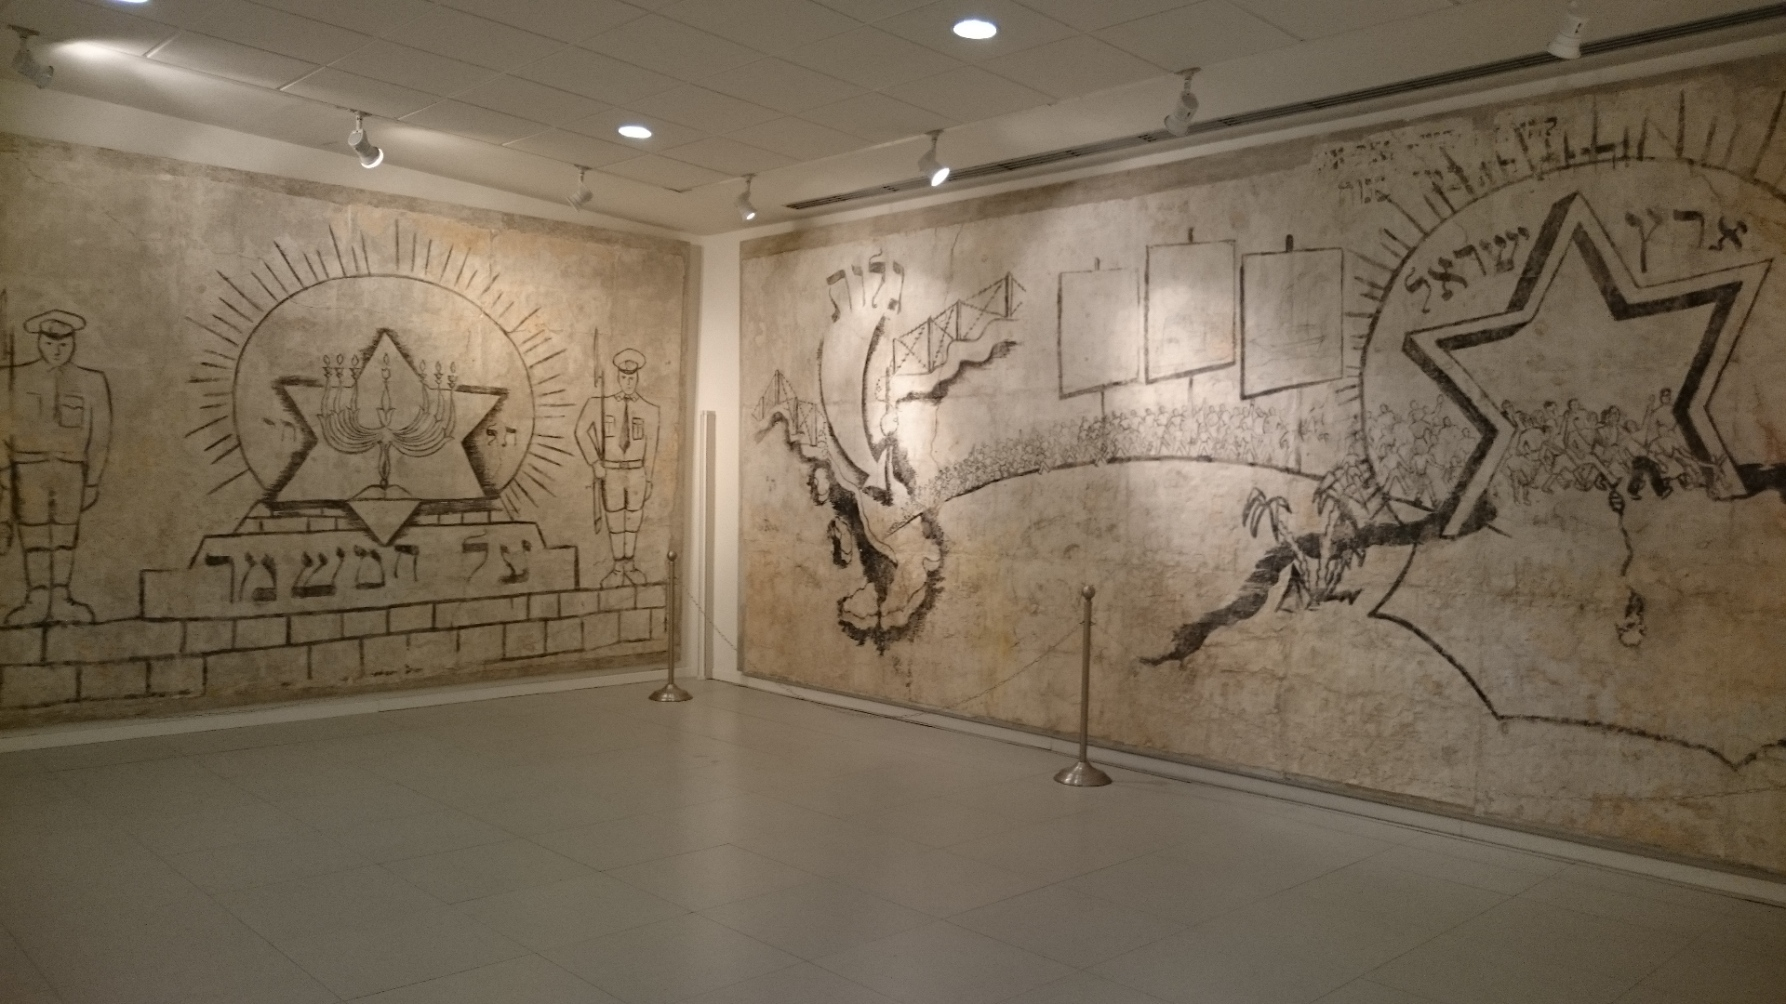 La Storia Appesa Ai Muri Campo N° 34 Agenzia Liliana